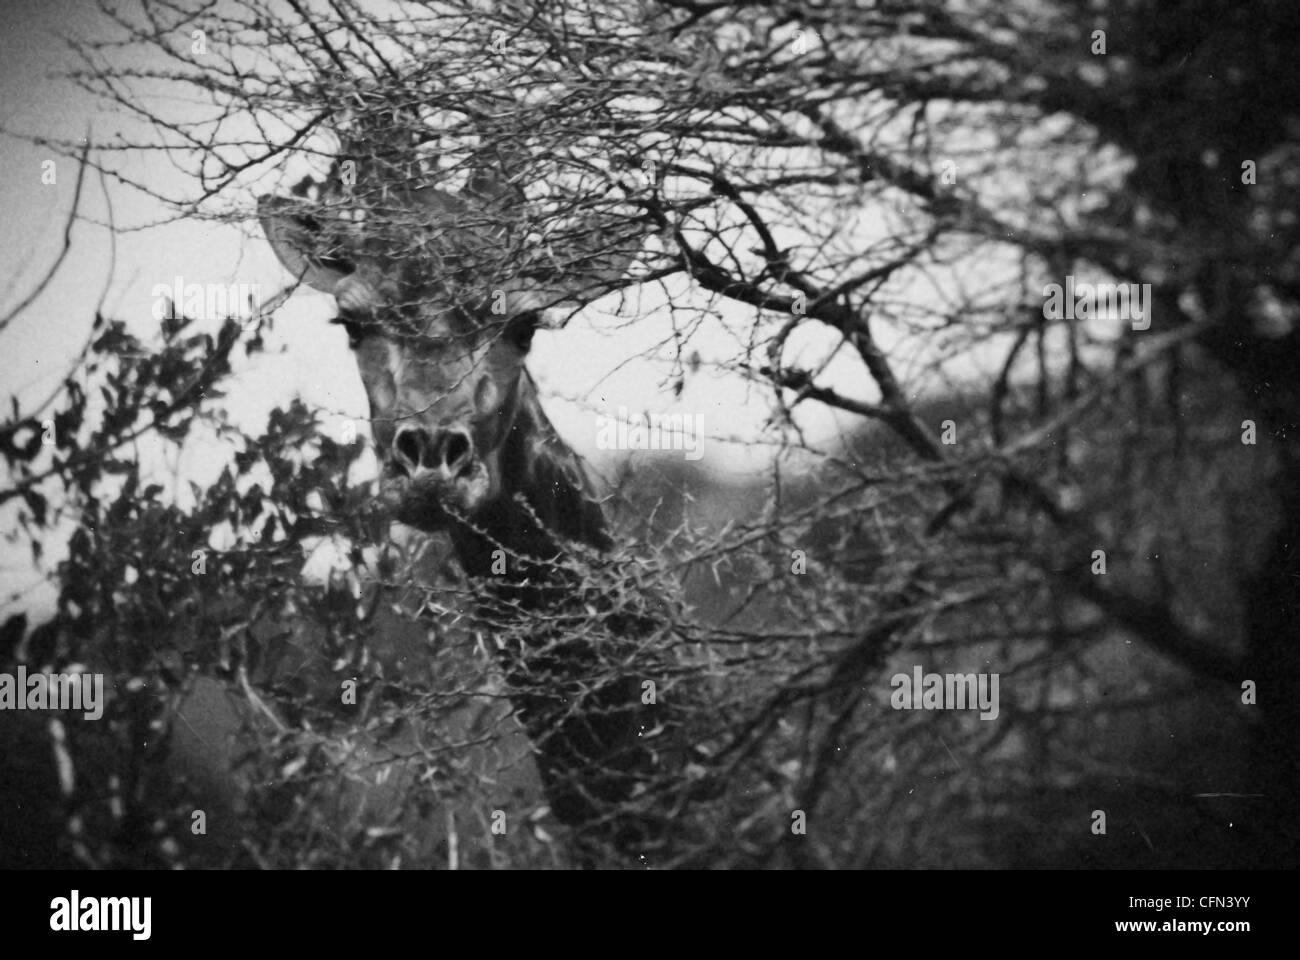 A giraffe in Botswana - Stock Image